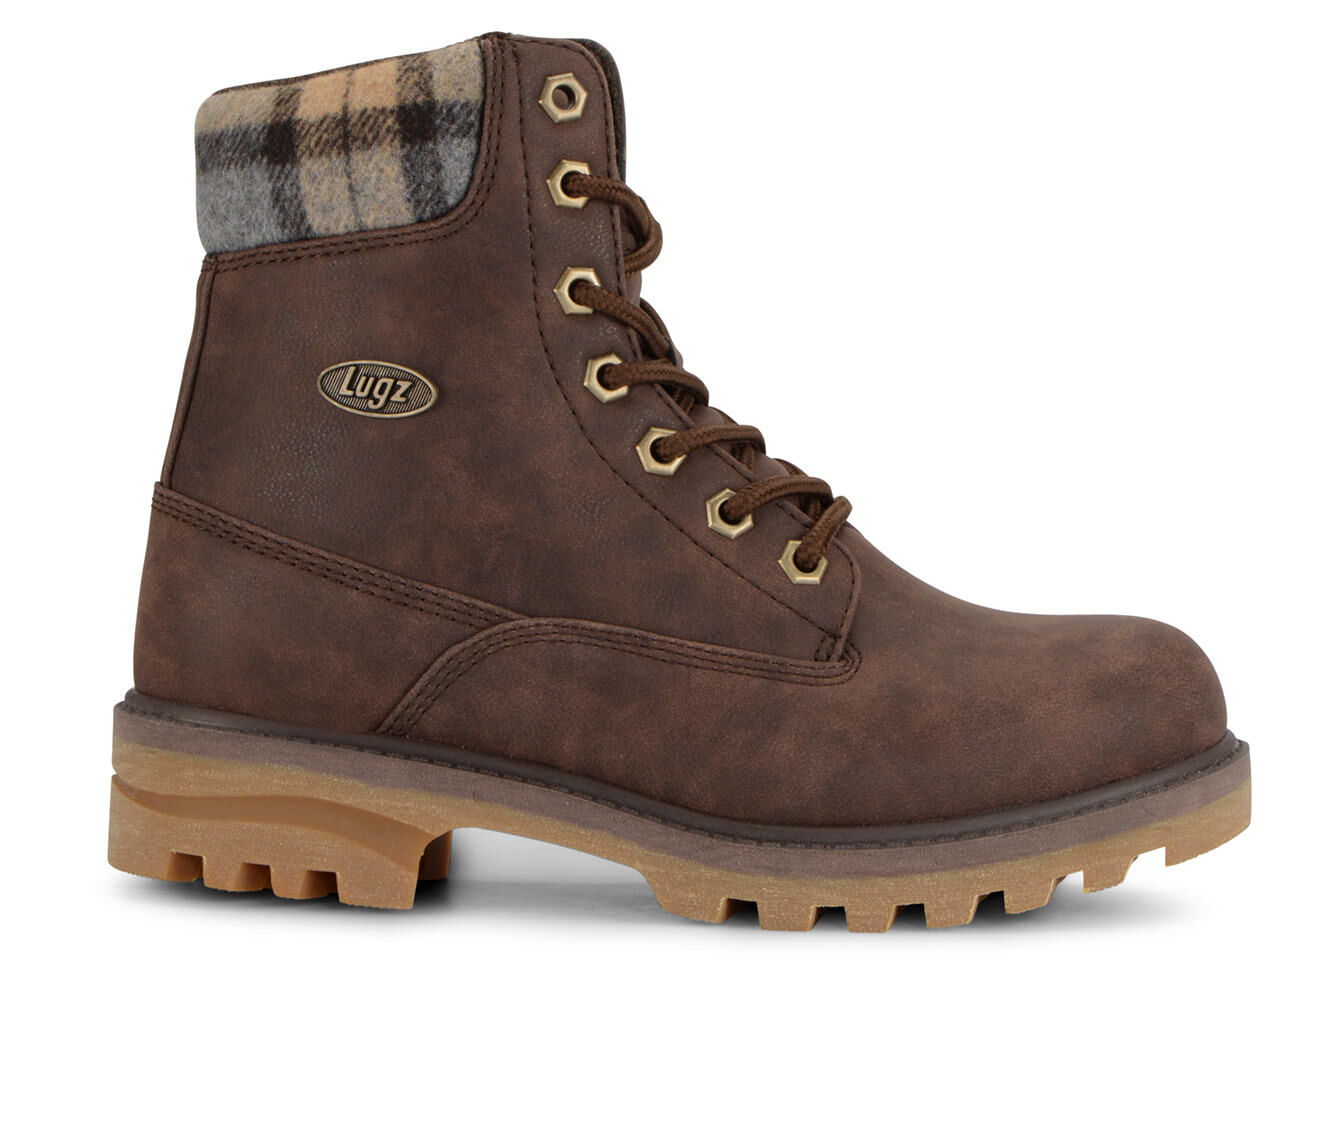 choose authentic Women's Lugz Empire Hi Hiking Boots Dark Brown